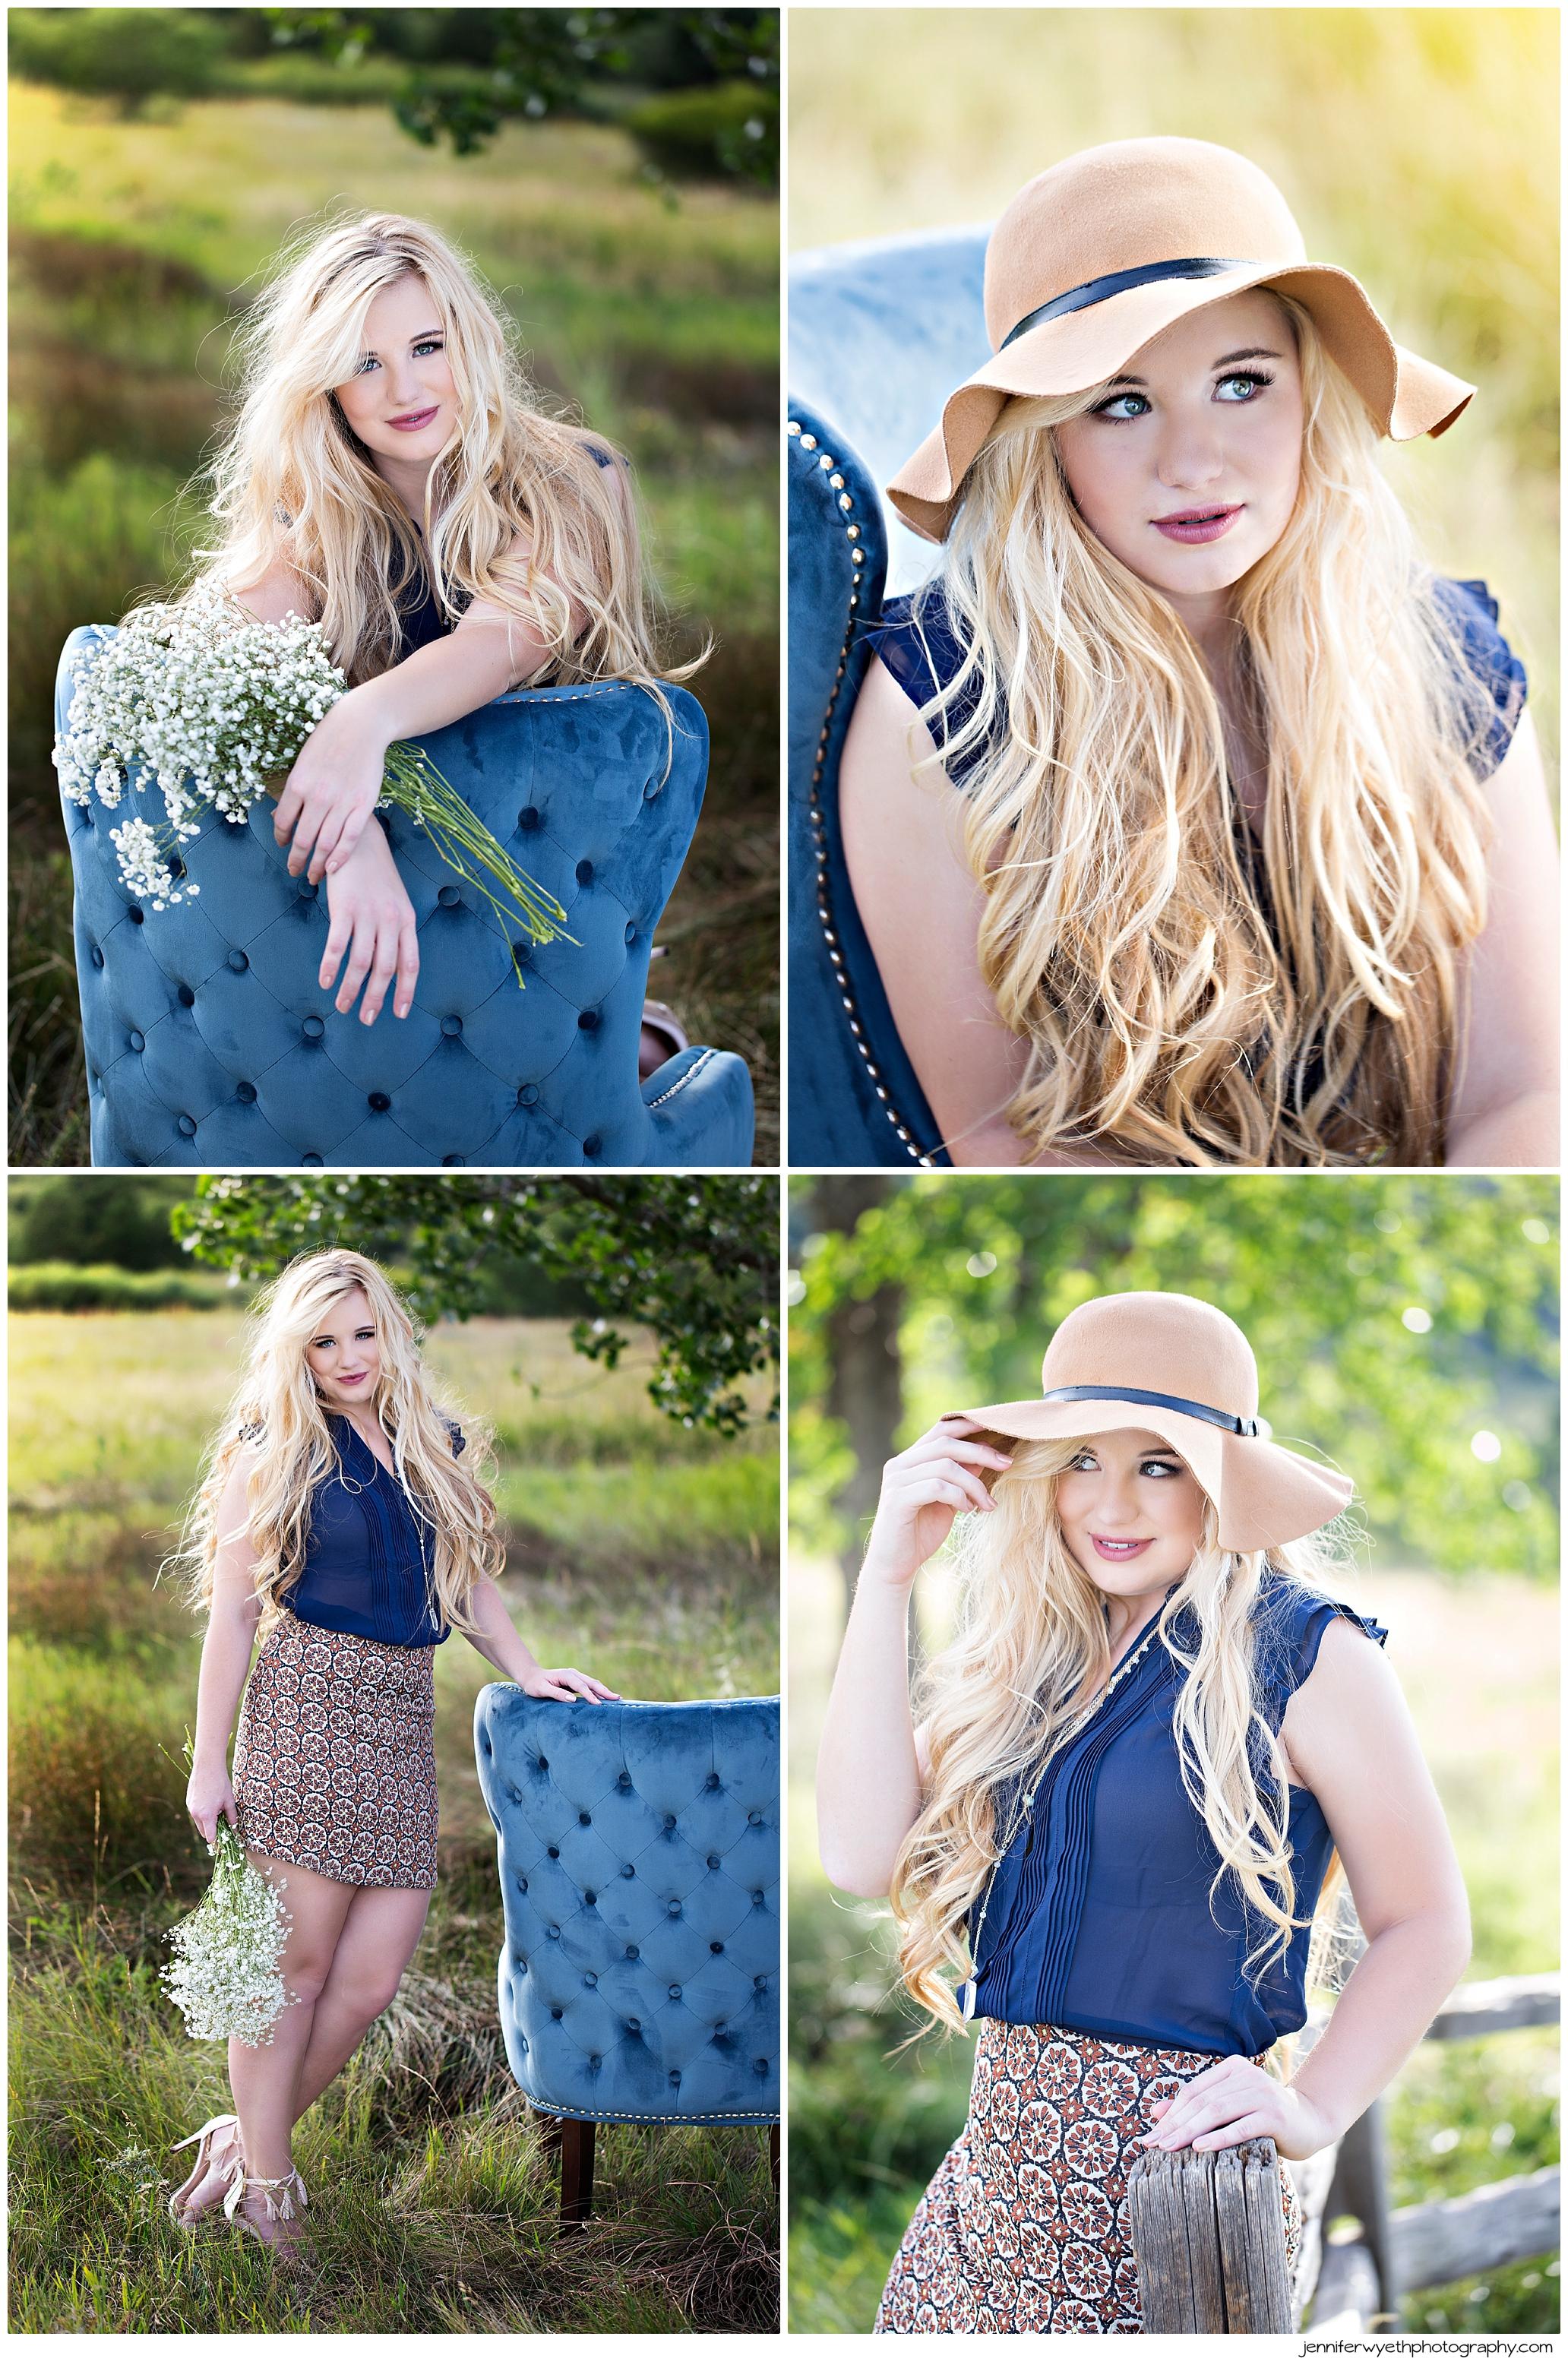 Jennifer-Wyeth-photography-senior-pictures-colorado-springs-photographer_0171.jpg